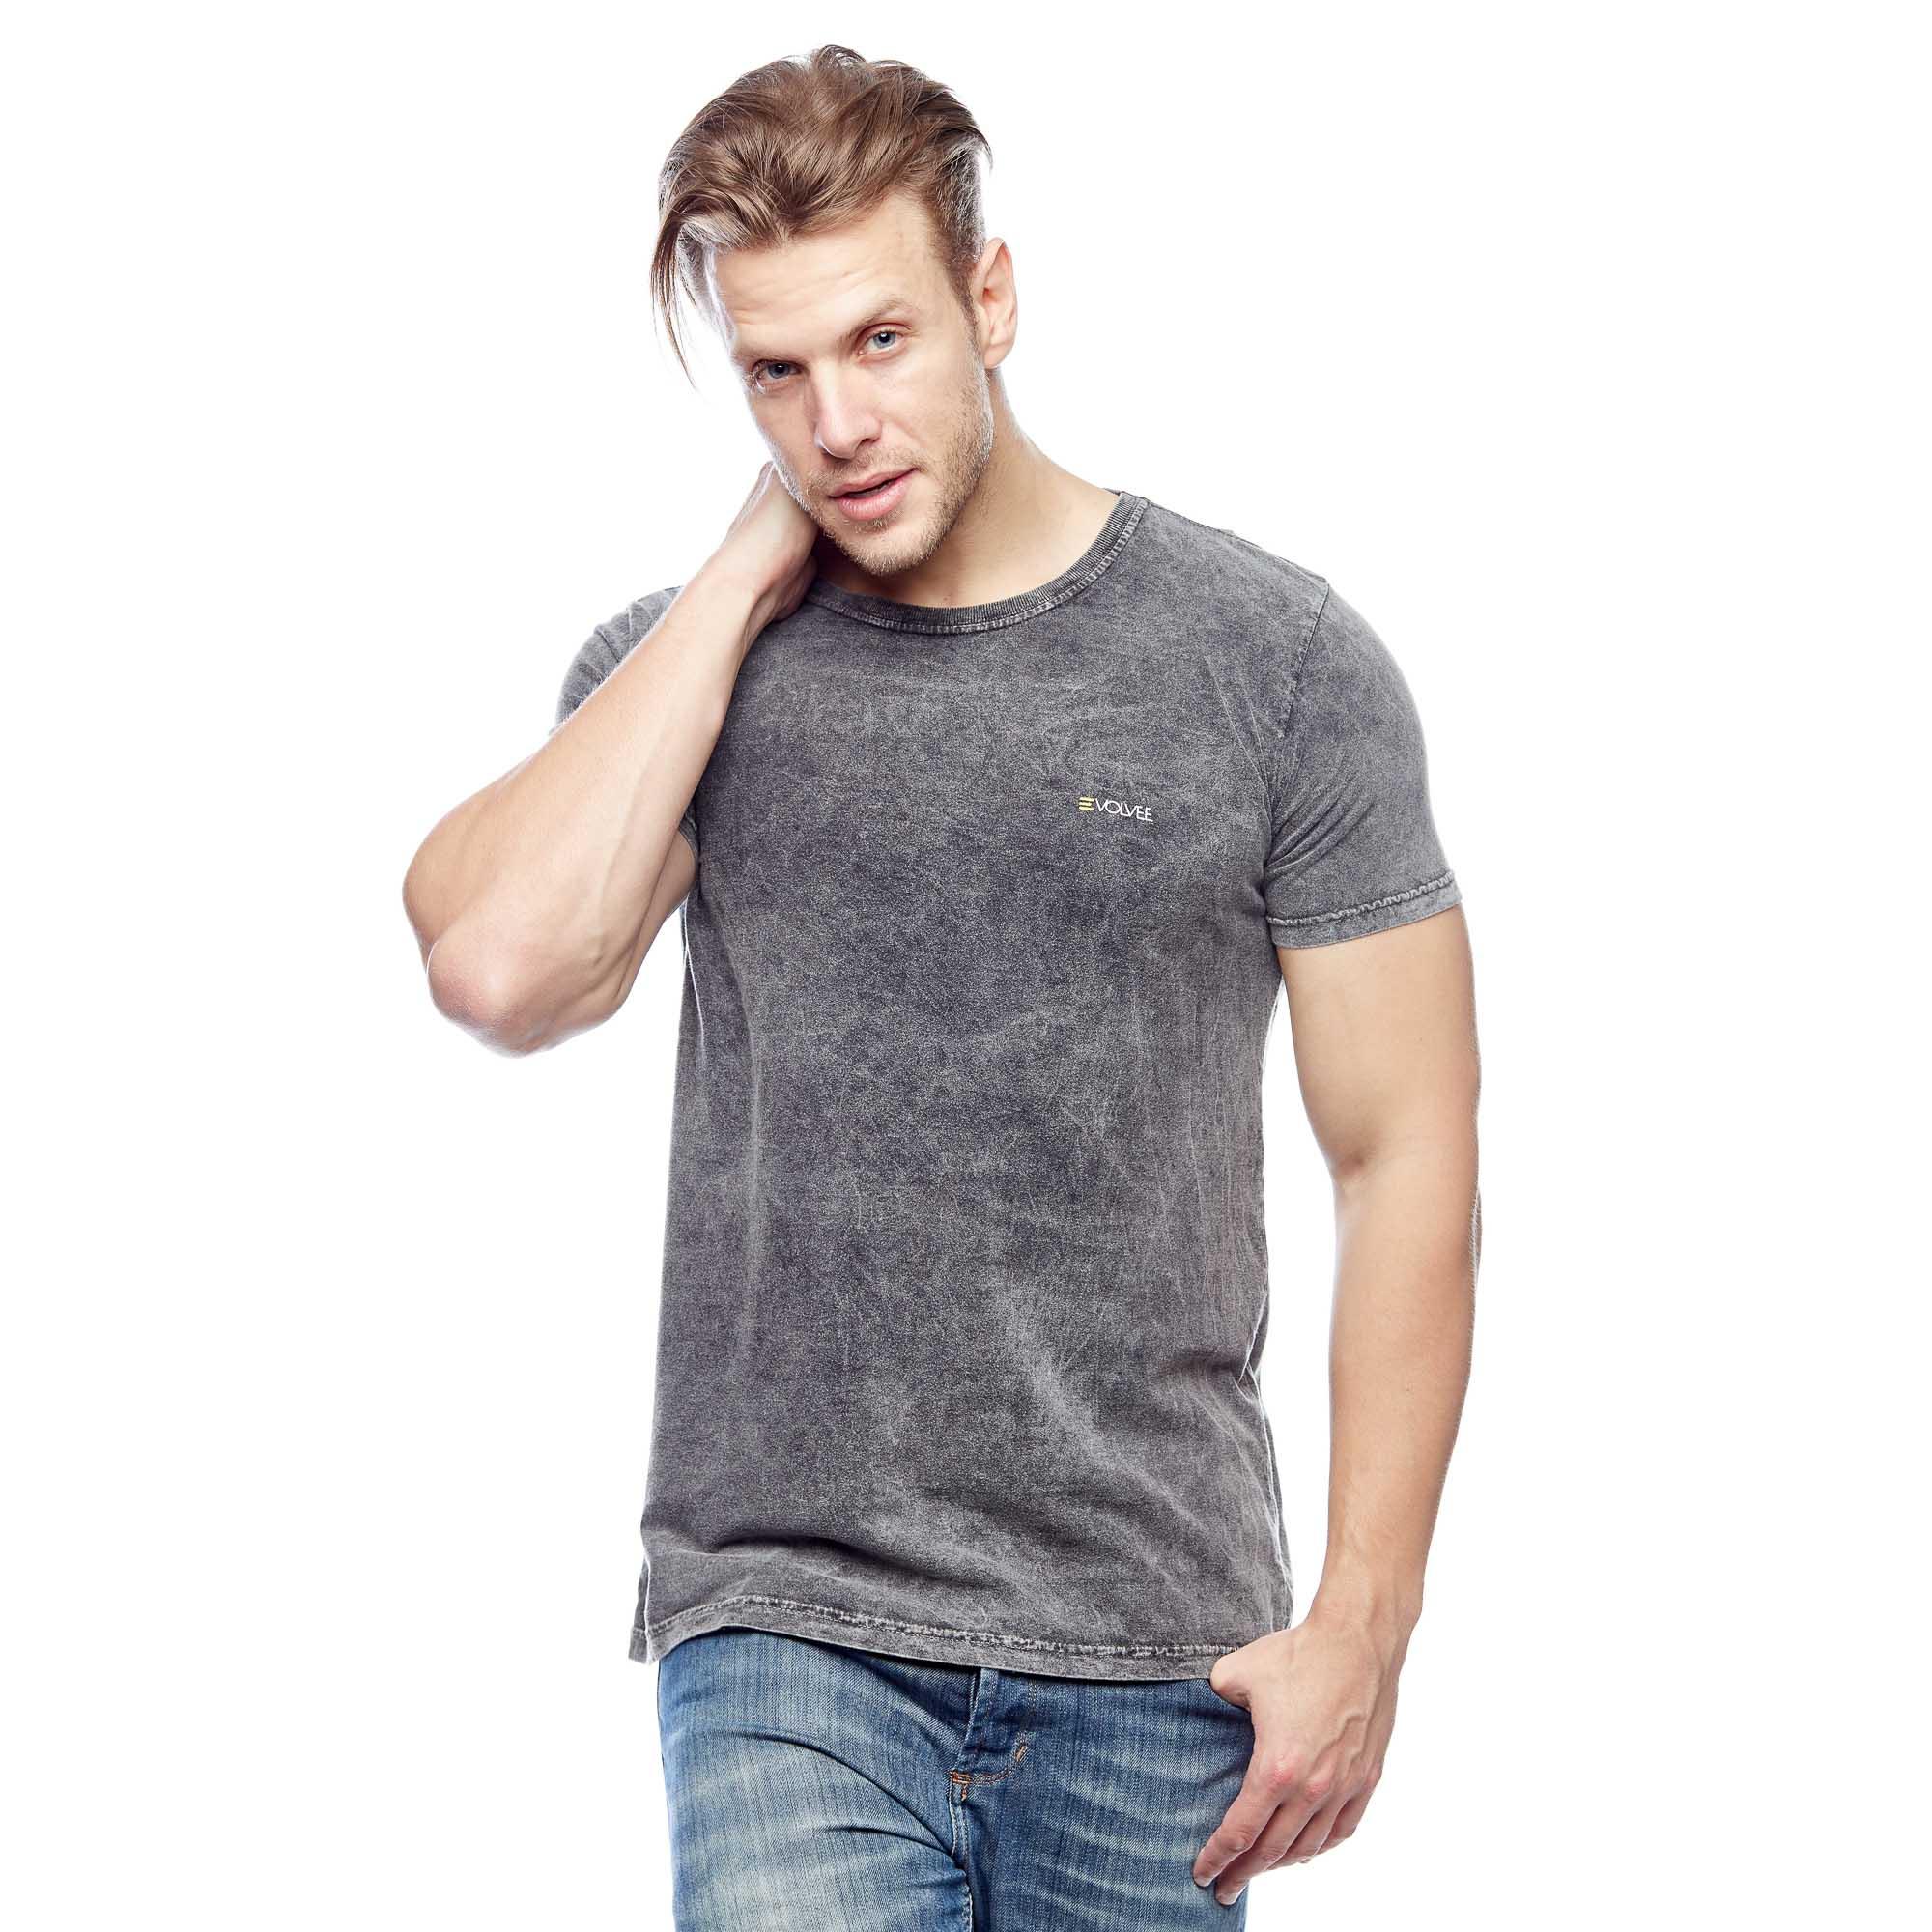 Camiseta Básica Marmorizada Tradicional Masculina Evolvee